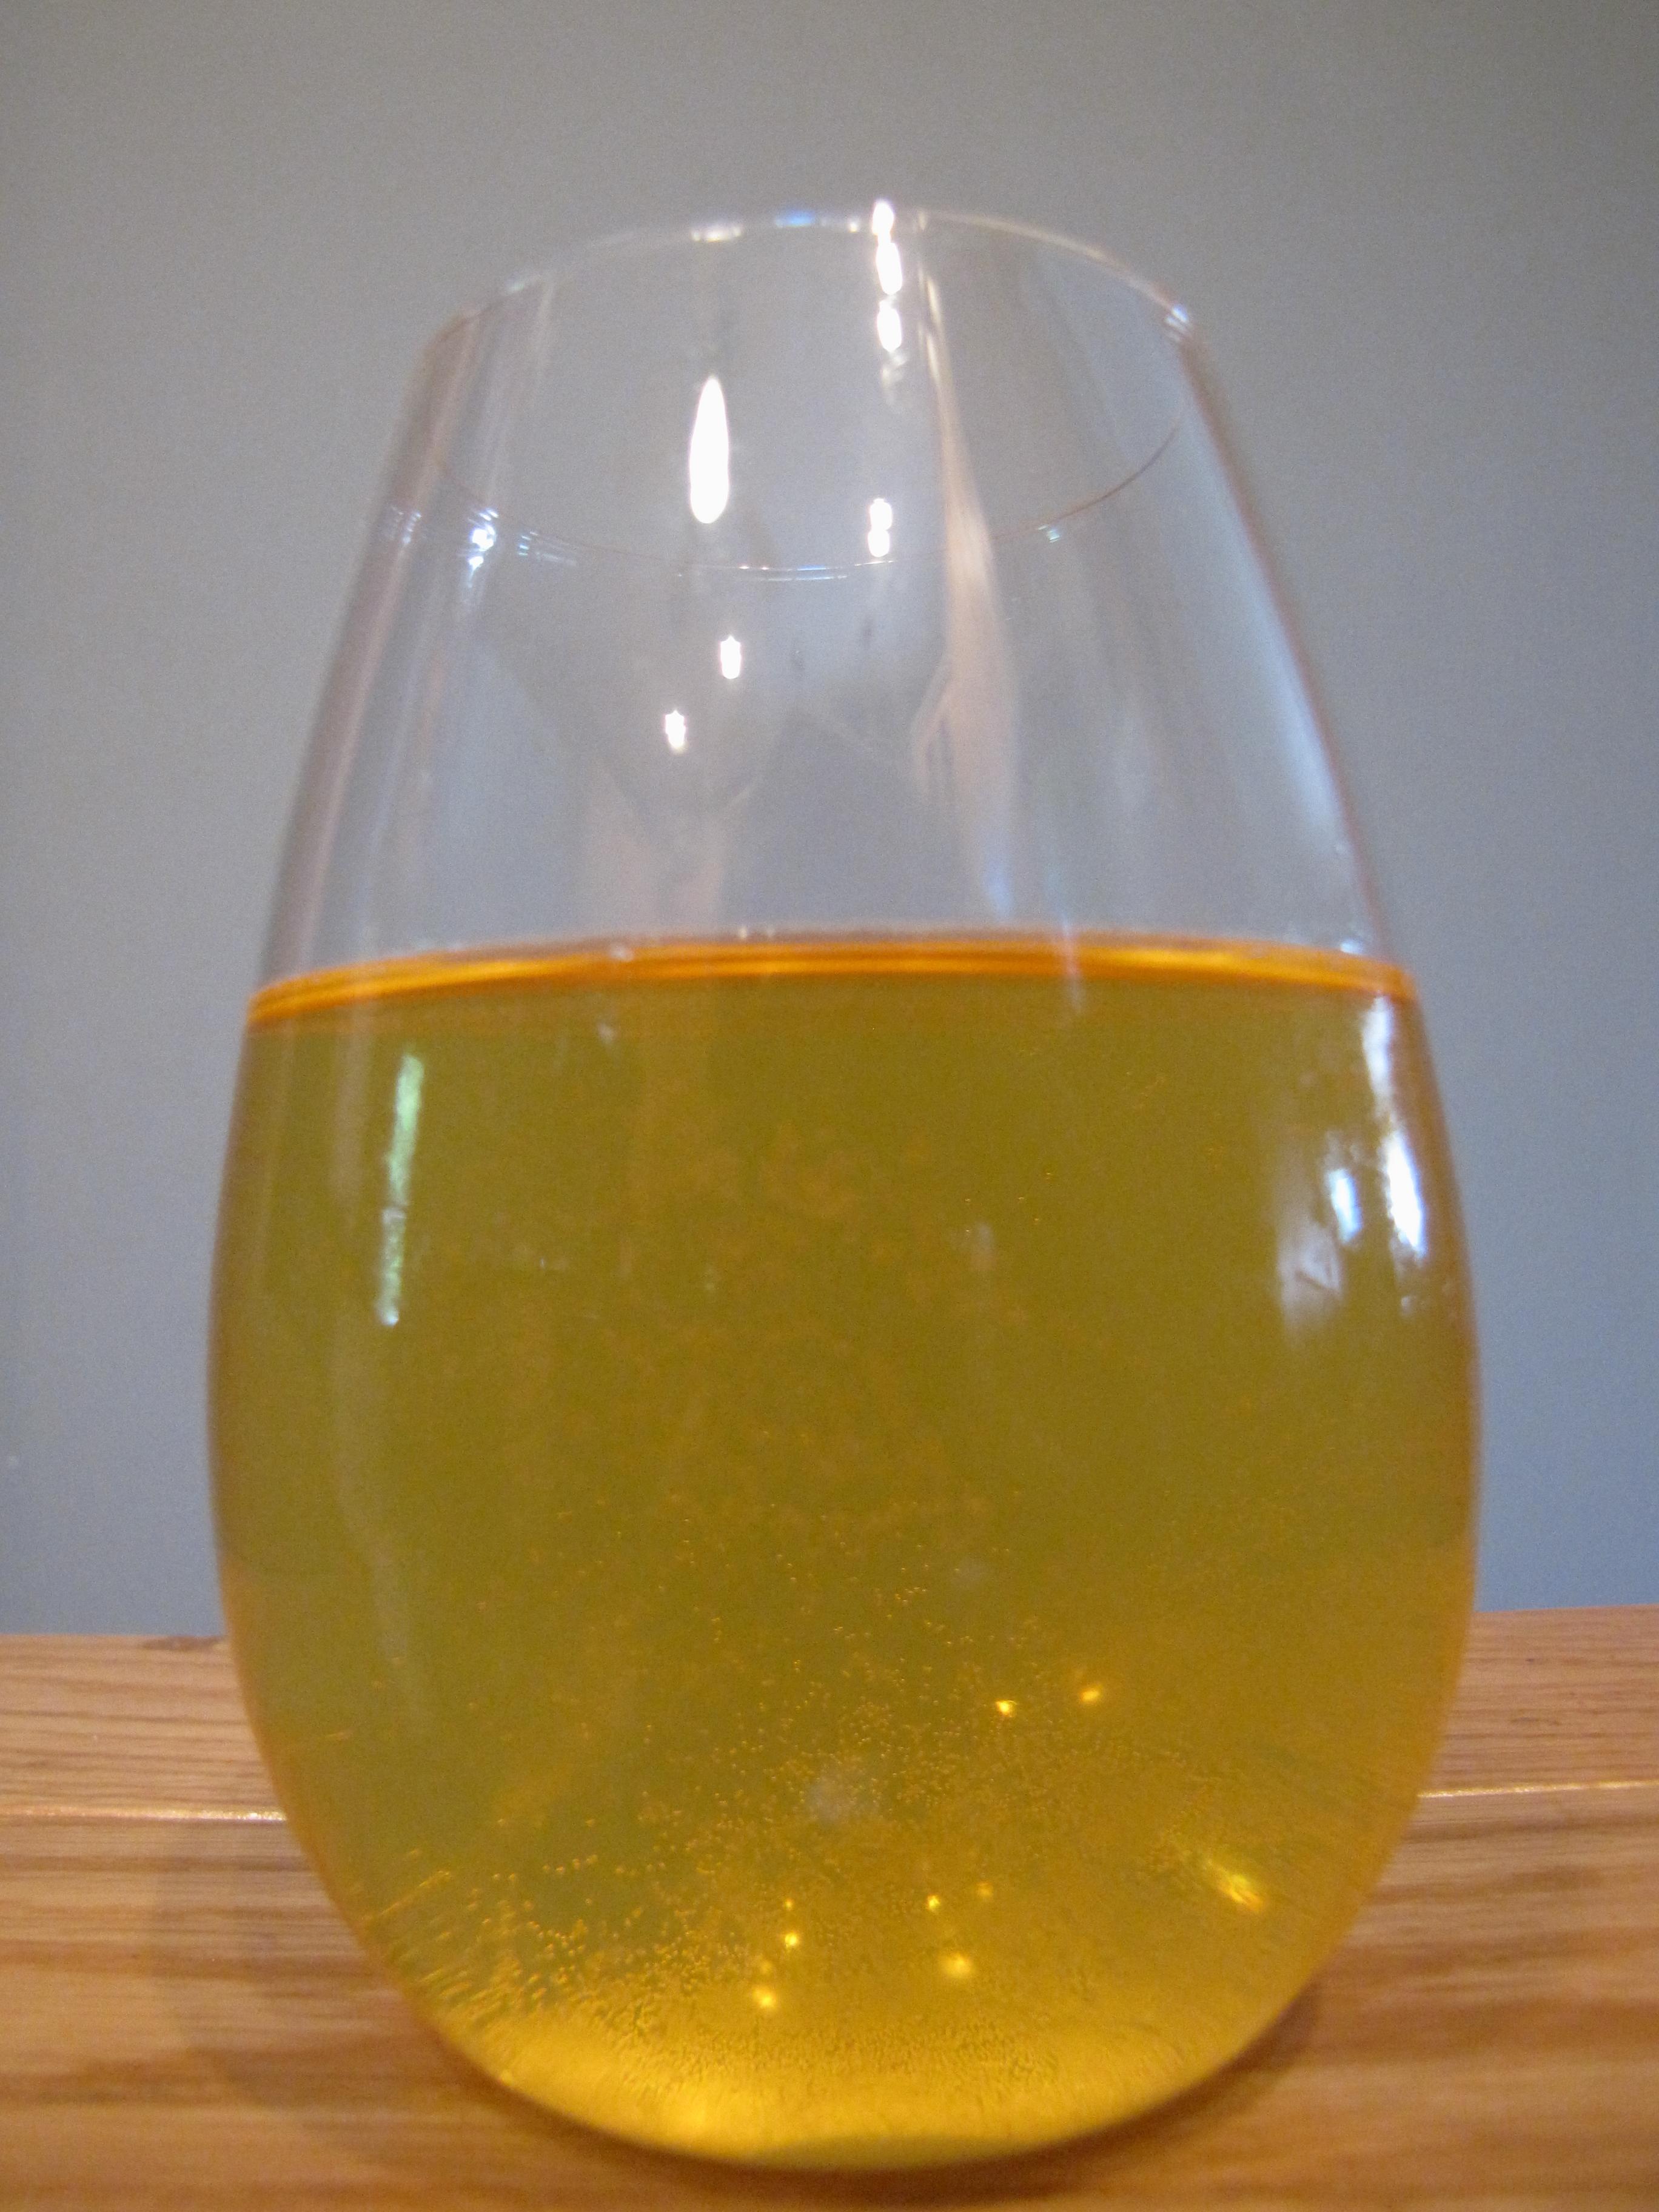 Anthony Mirabella Sparkling Cider (2009)